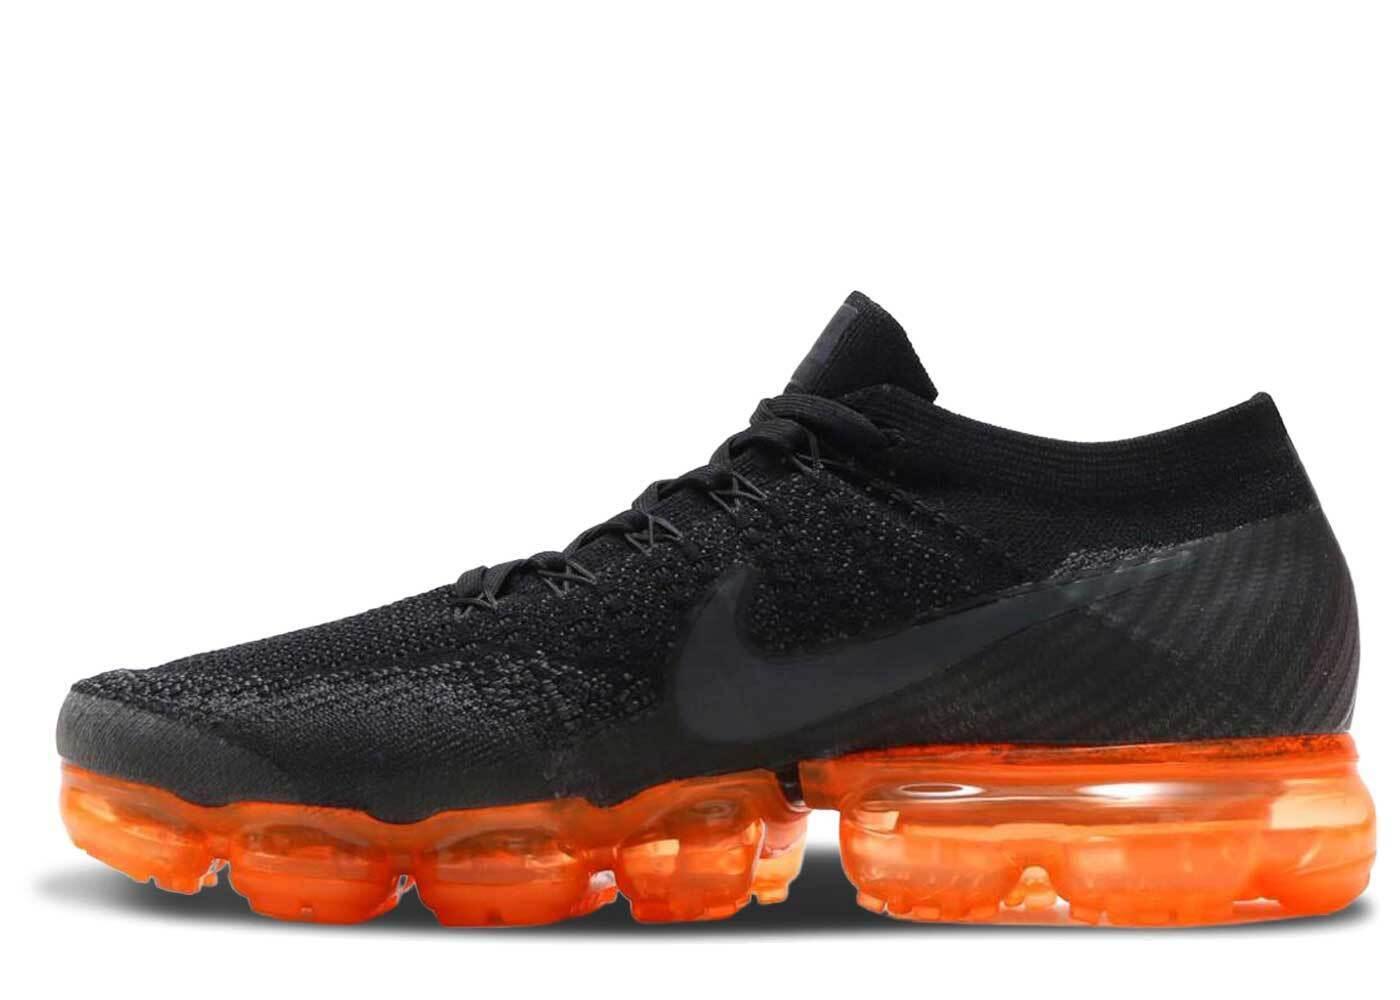 Nike Air VaporMax Black Orangeの写真